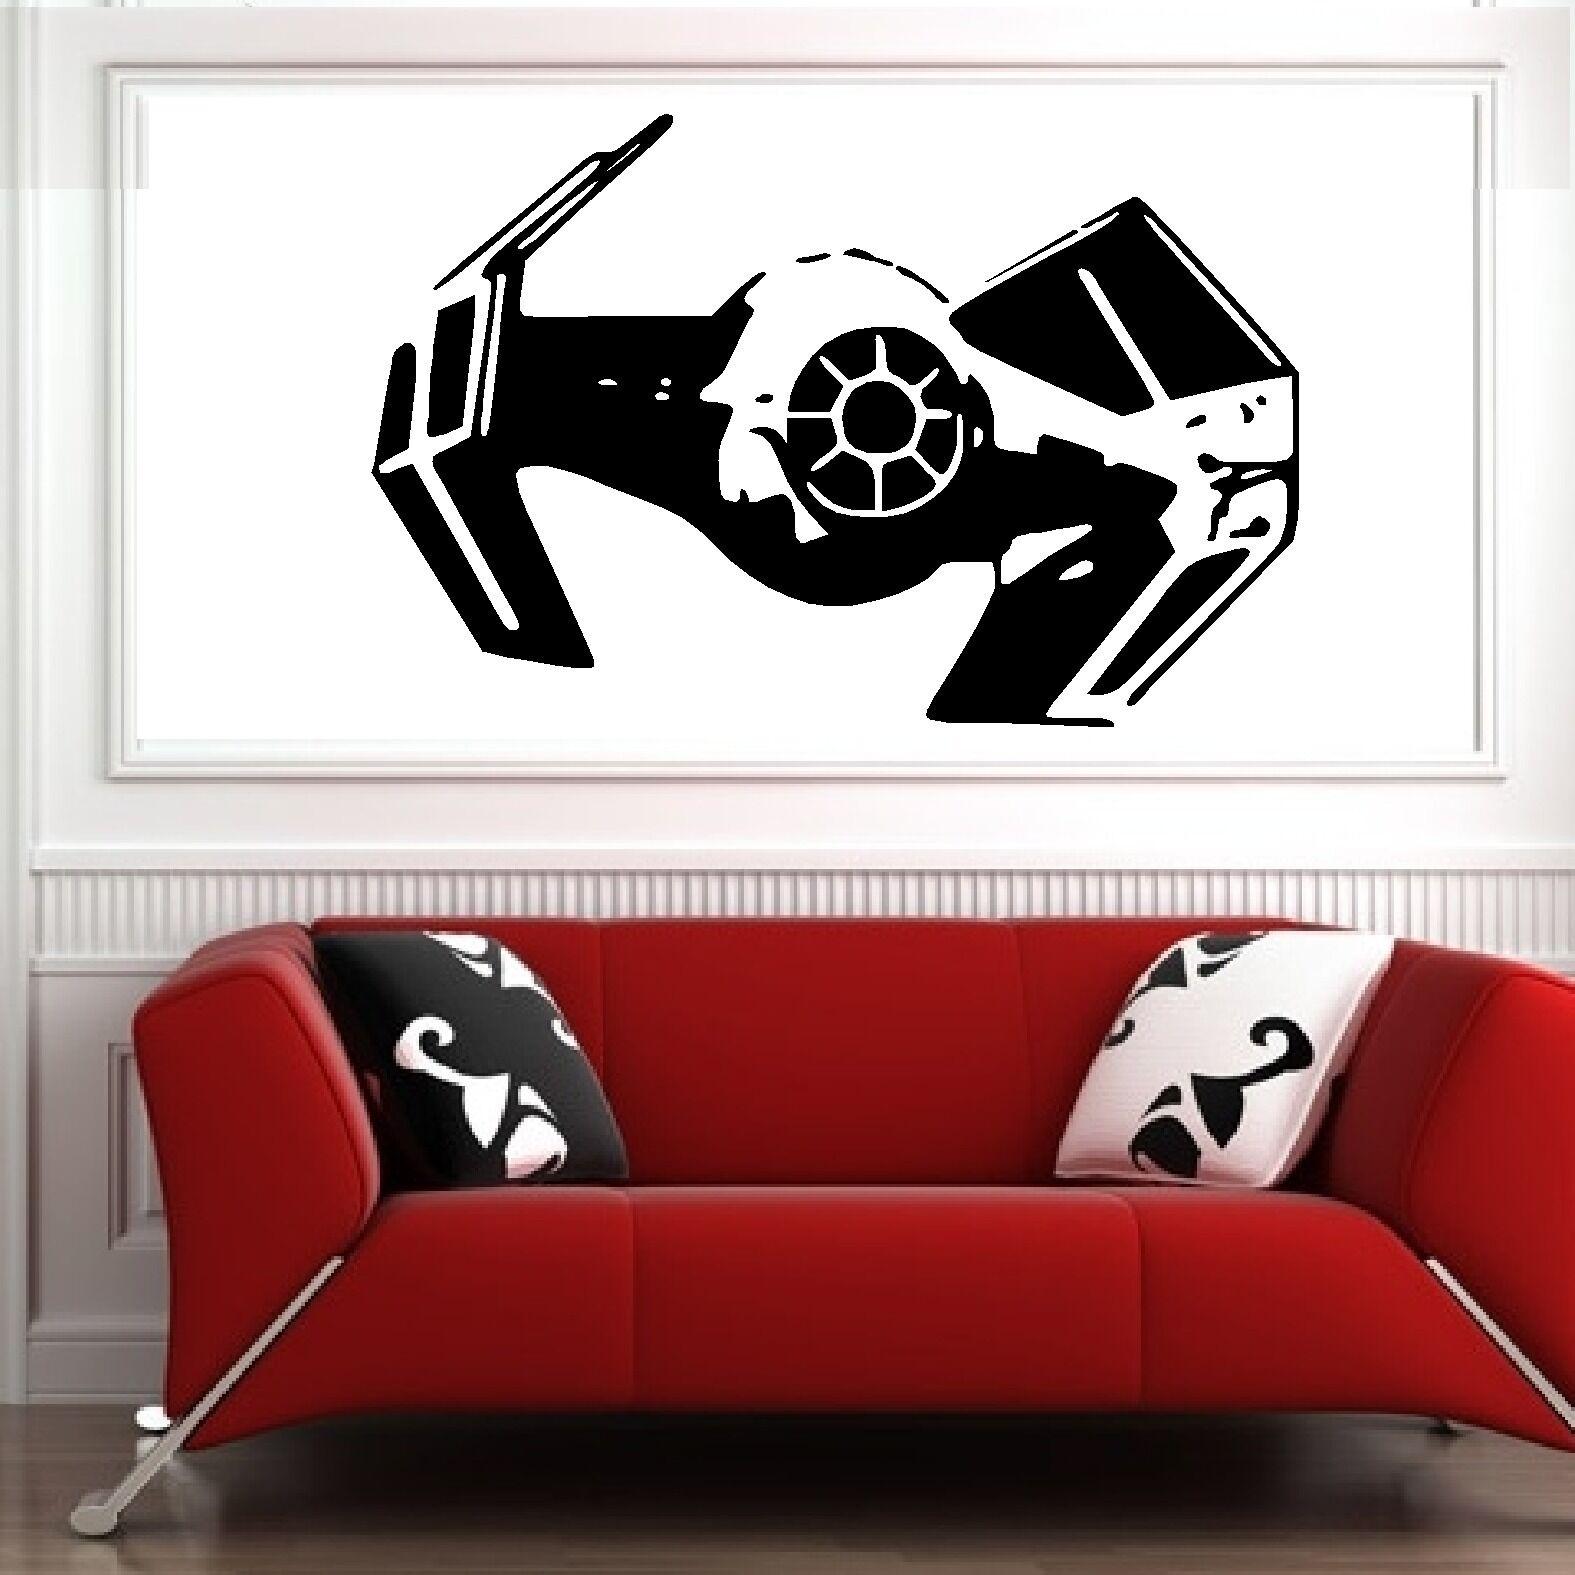 Star Wars Bedroom Accessories Star Wars Darth Vader Tie Fighter Vinyl Wall Art Sticker